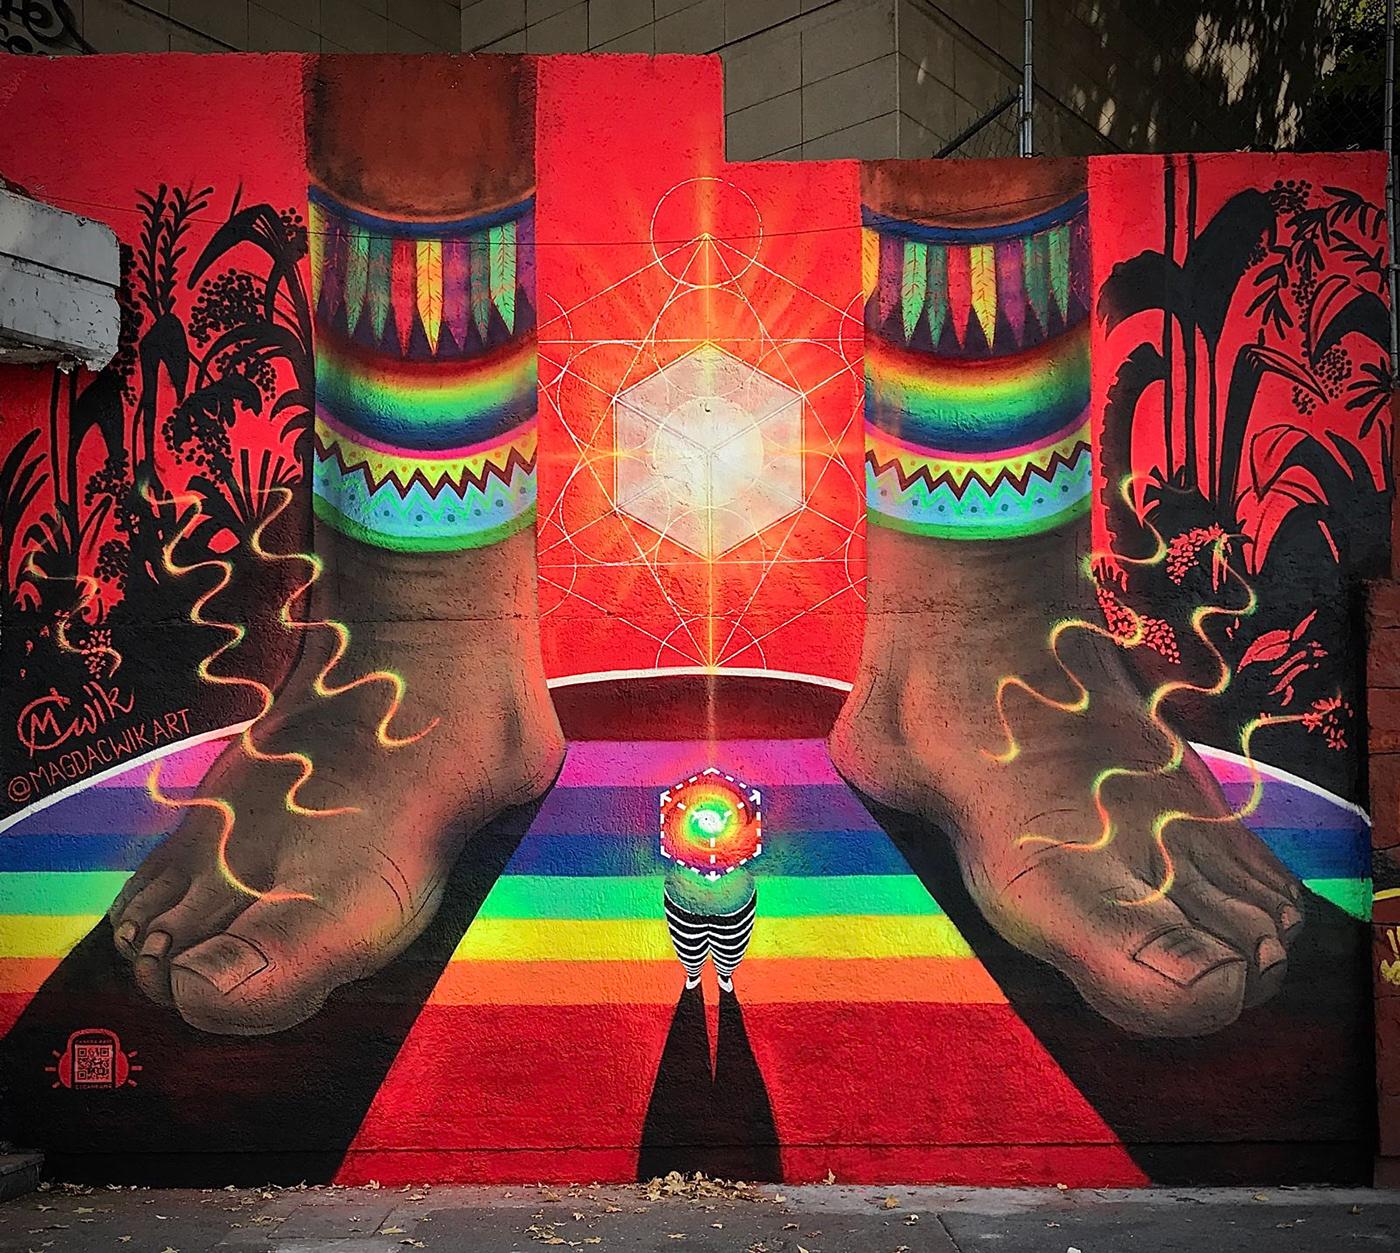 art,artwork,Female Street Artist,Frequency,Interaction Art,Love,Mural,music,Street Art ,vibrations